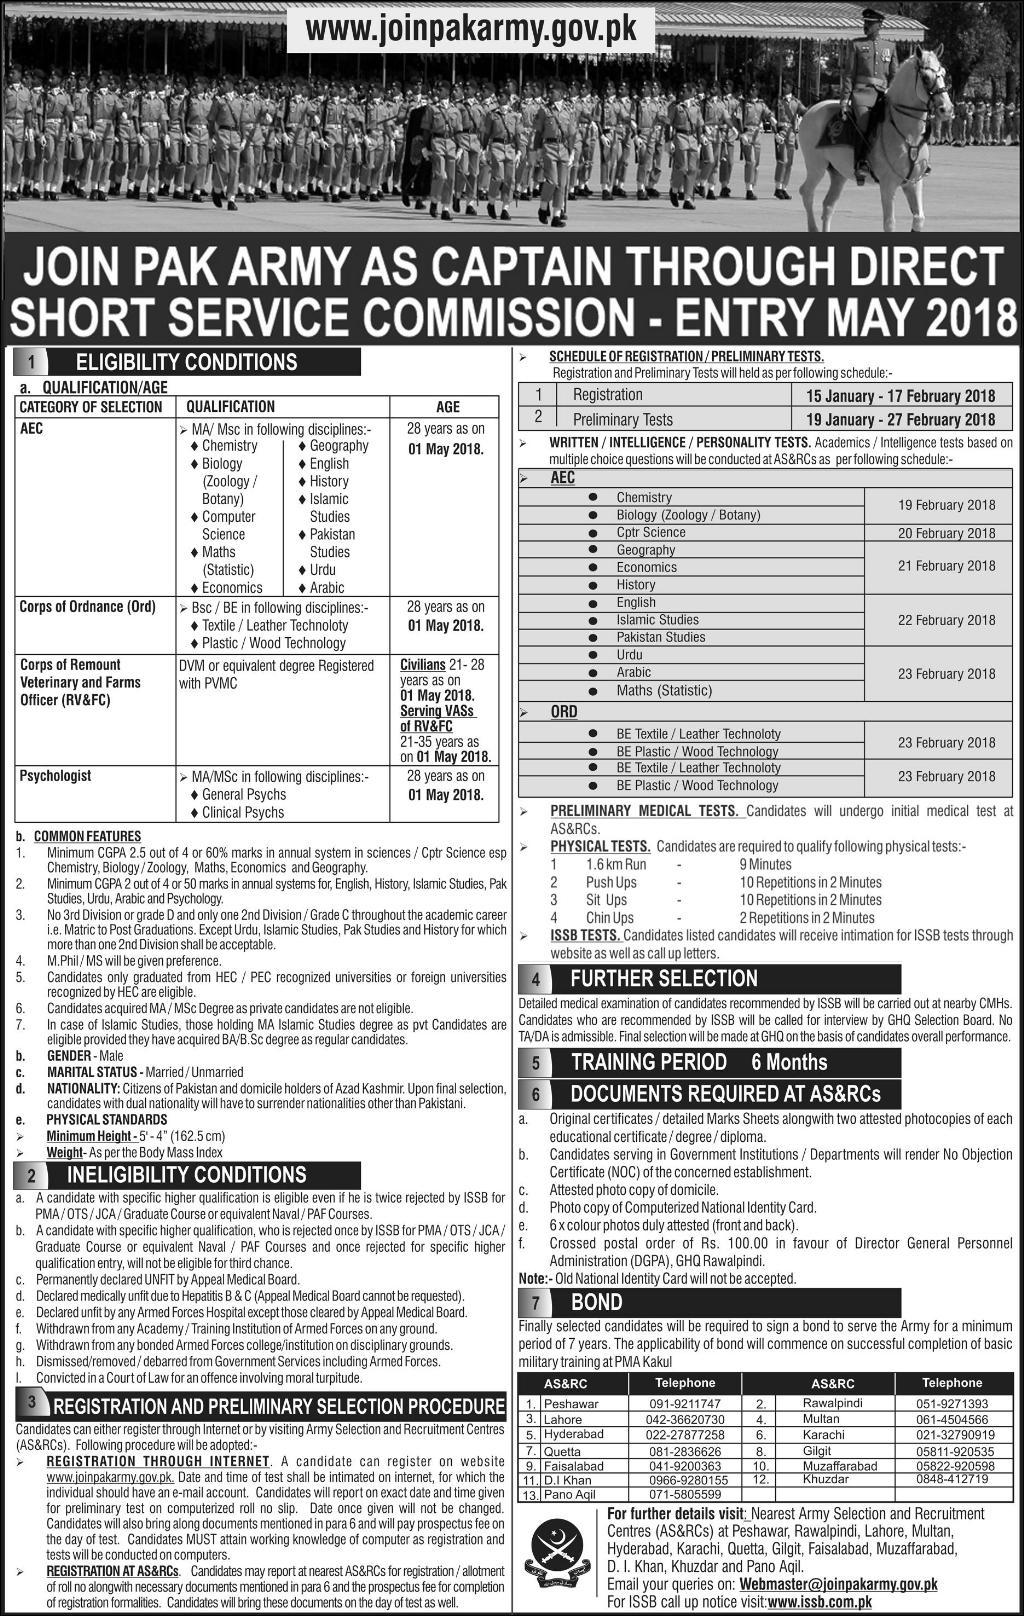 Join Pak Army As Captain 2018 Through Direct Commission DSSC Registration